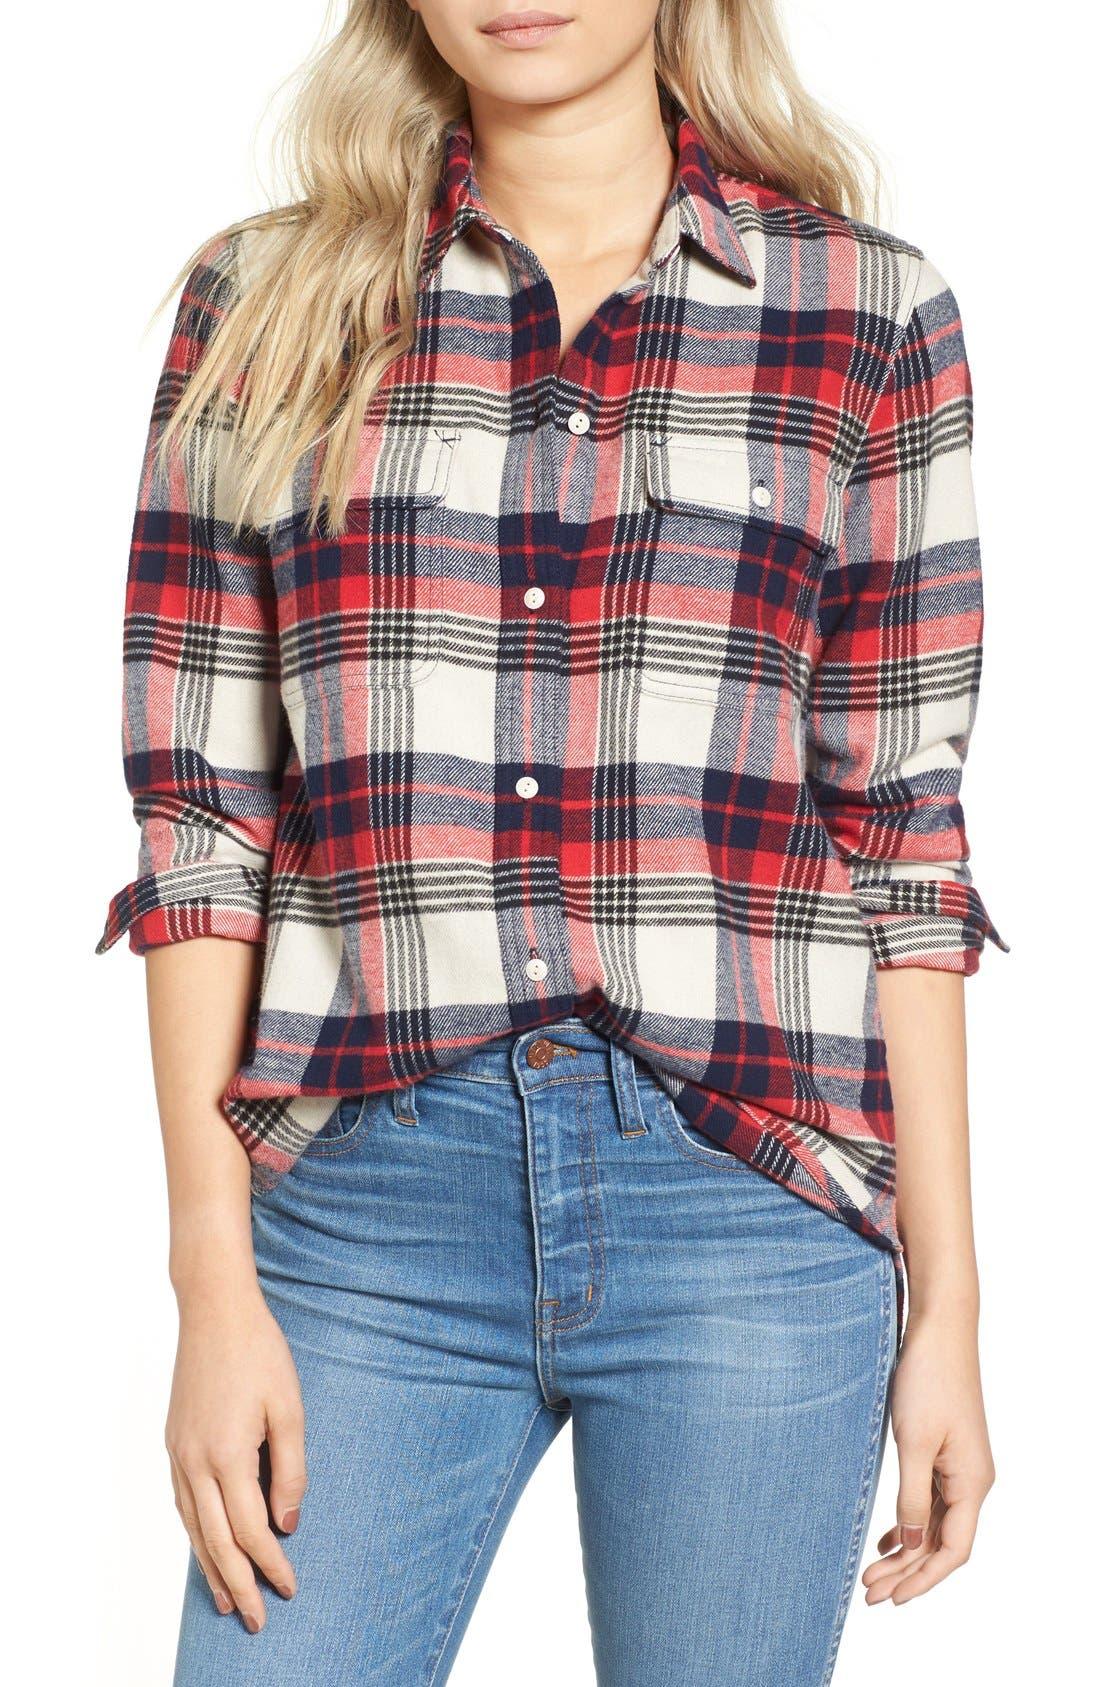 Alternate Image 1 Selected - Madewell Ex Boyfriend Plaid Flannel Shirt